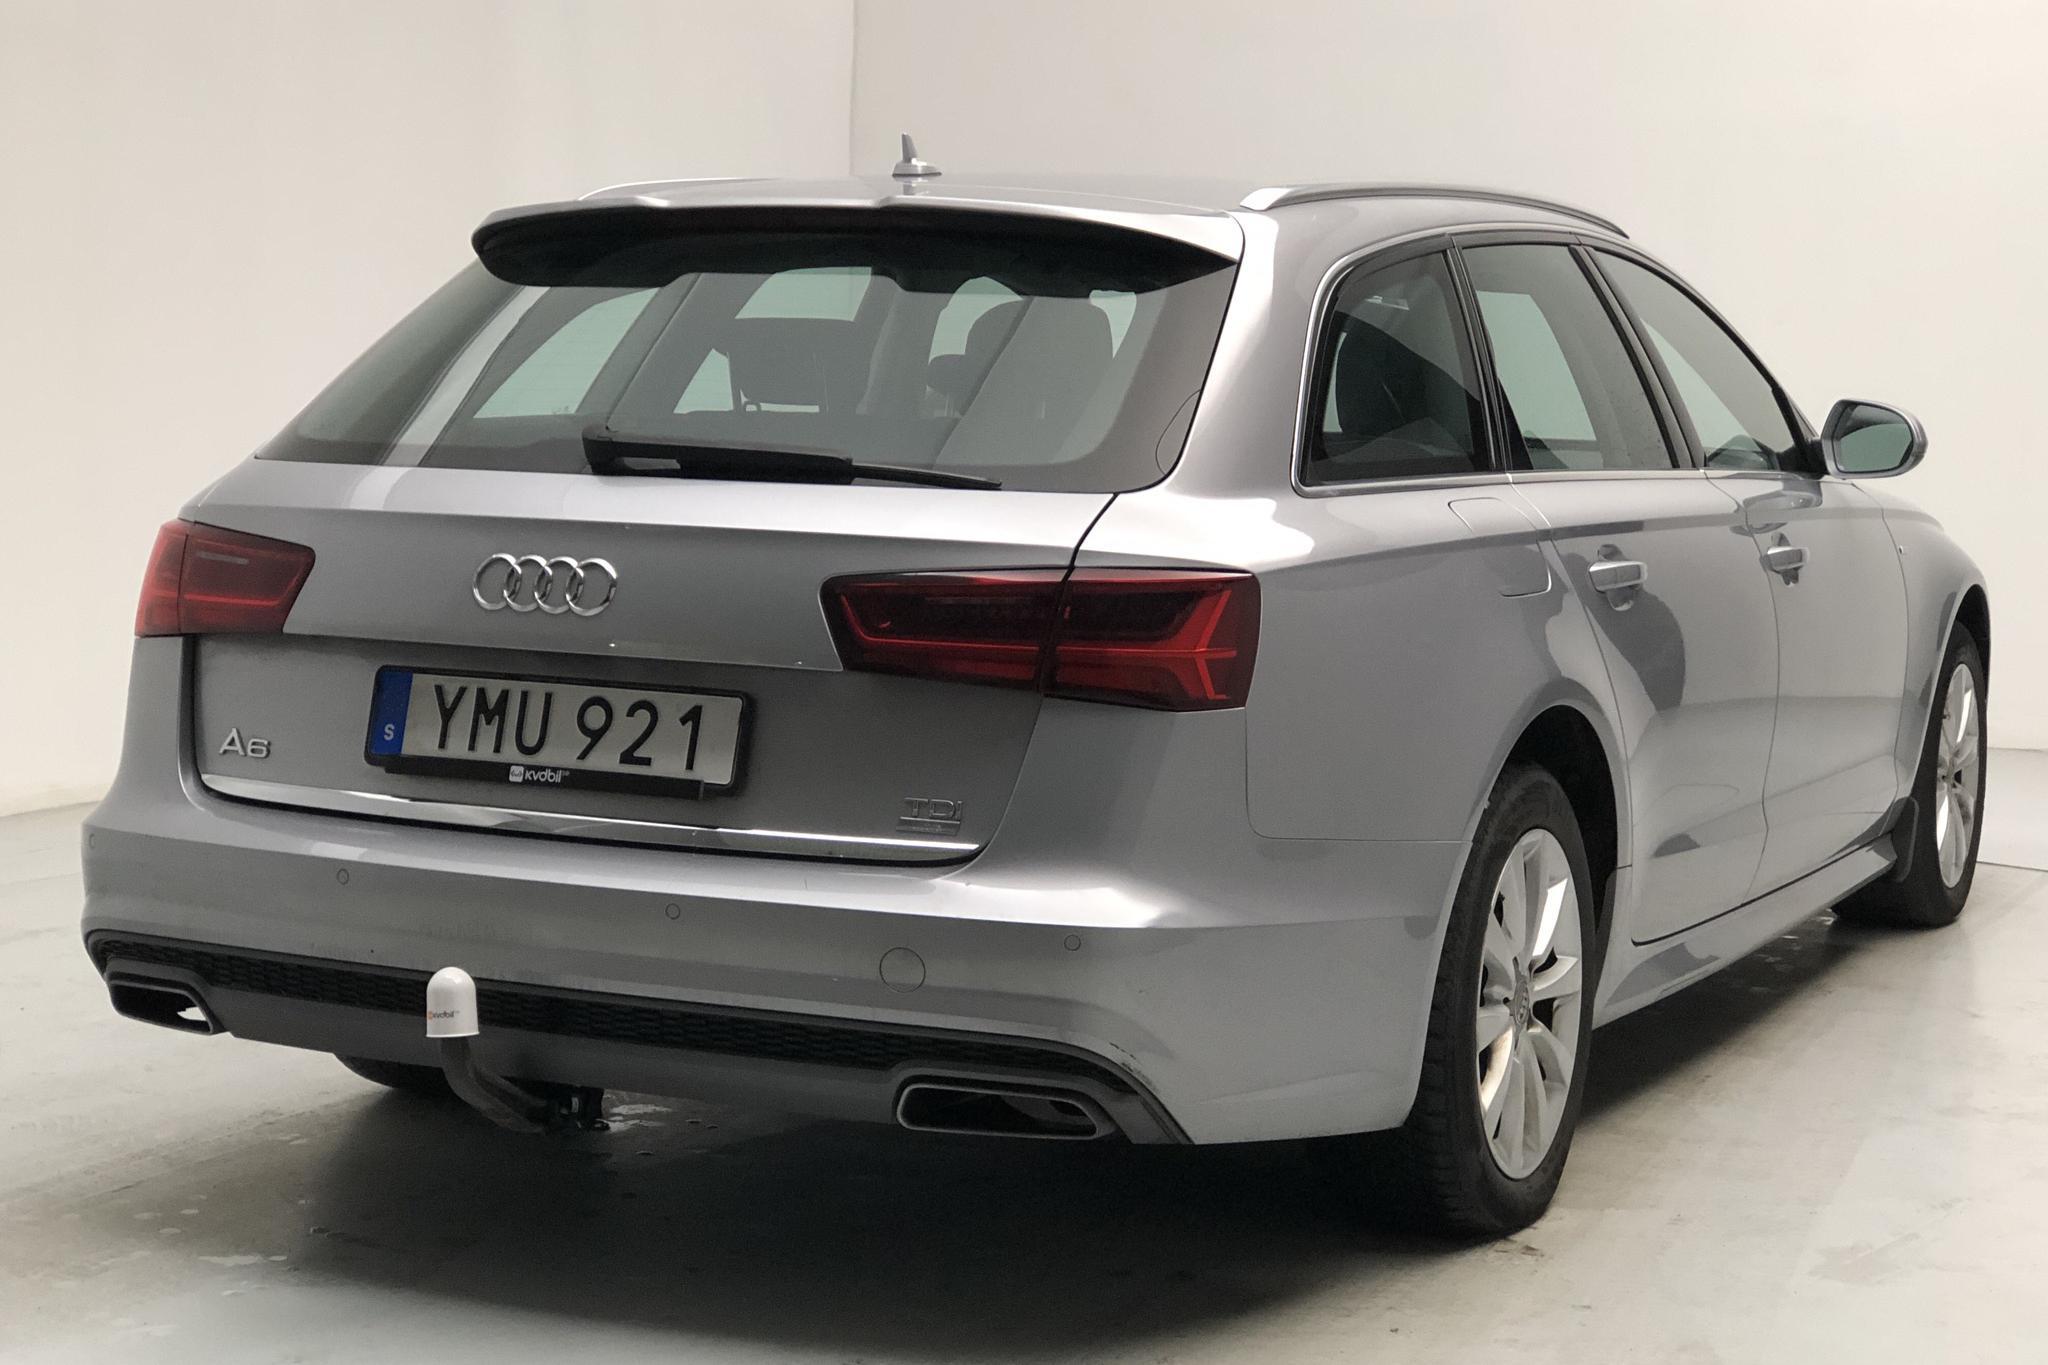 Audi A6 2.0 TDI Avant (190hk) - 8 232 mil - Automat - silver - 2018